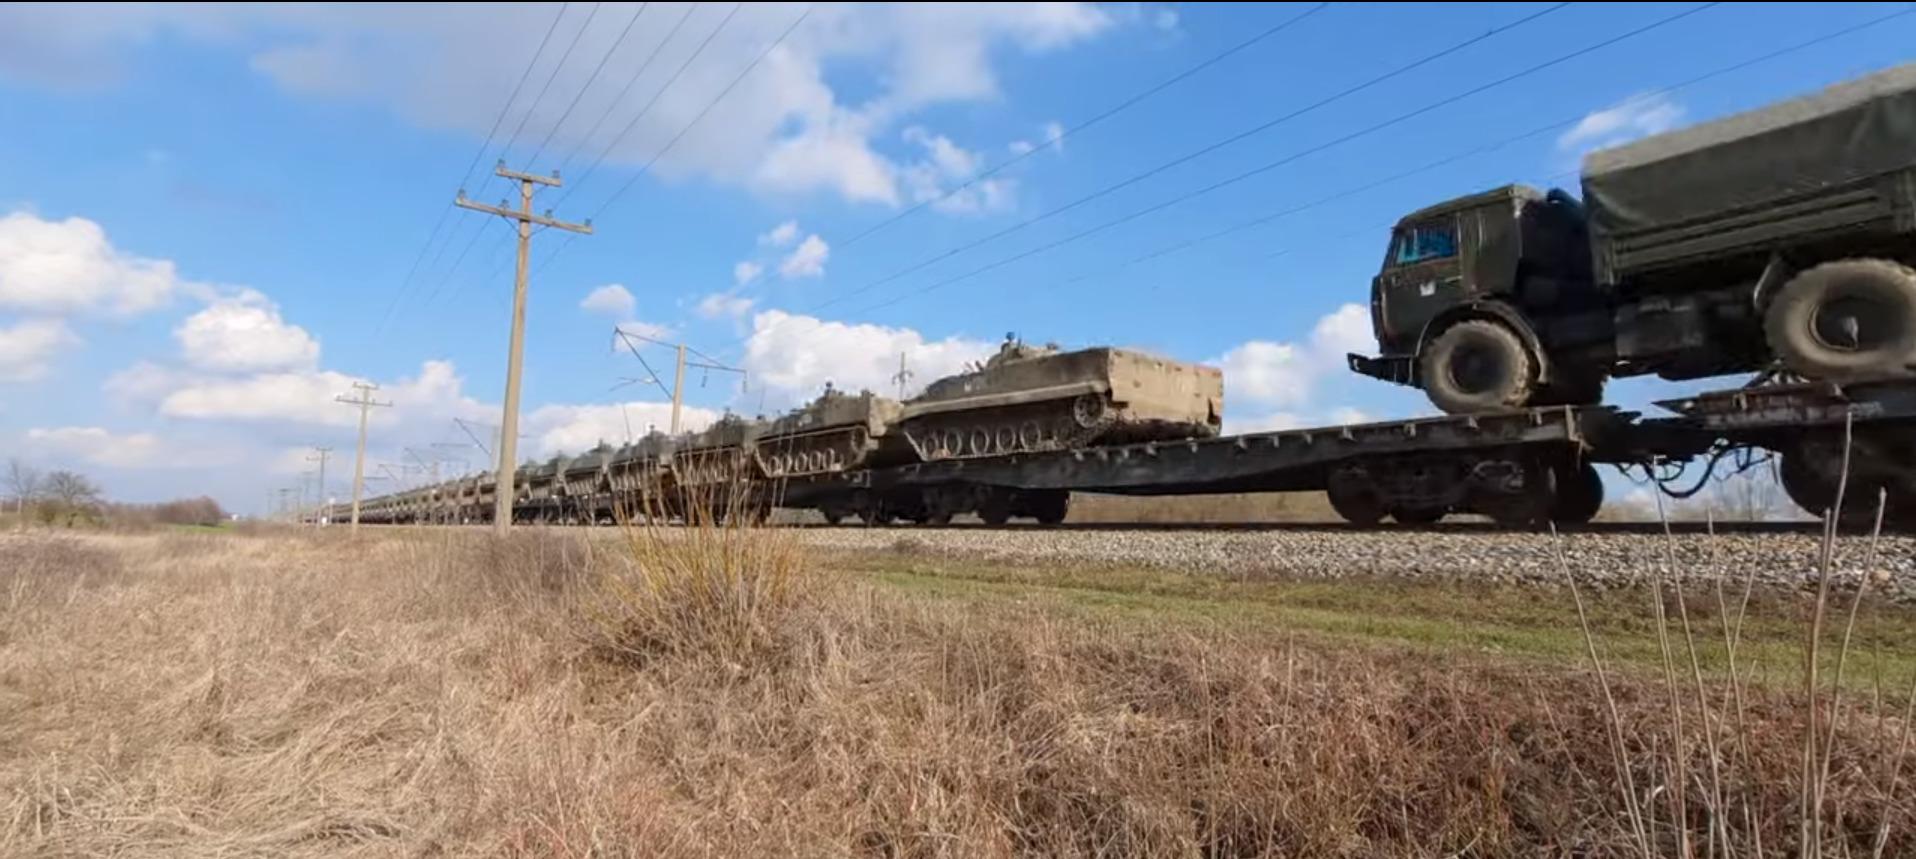 In Videos: Military Preparations In Ukraine, Russia, Belarus